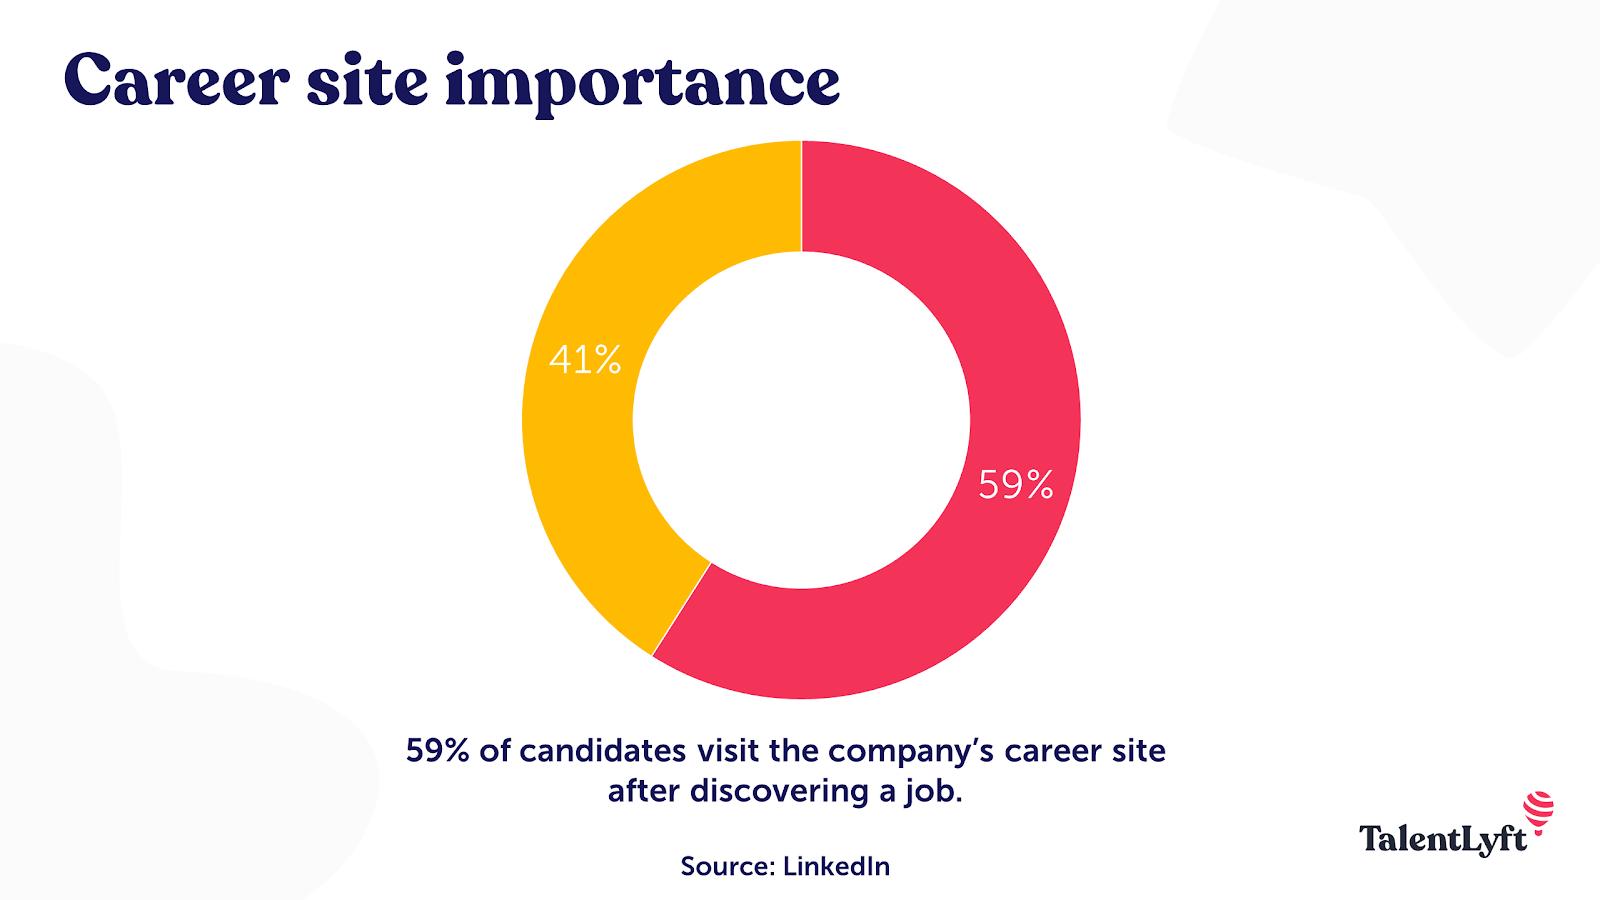 Career site importance